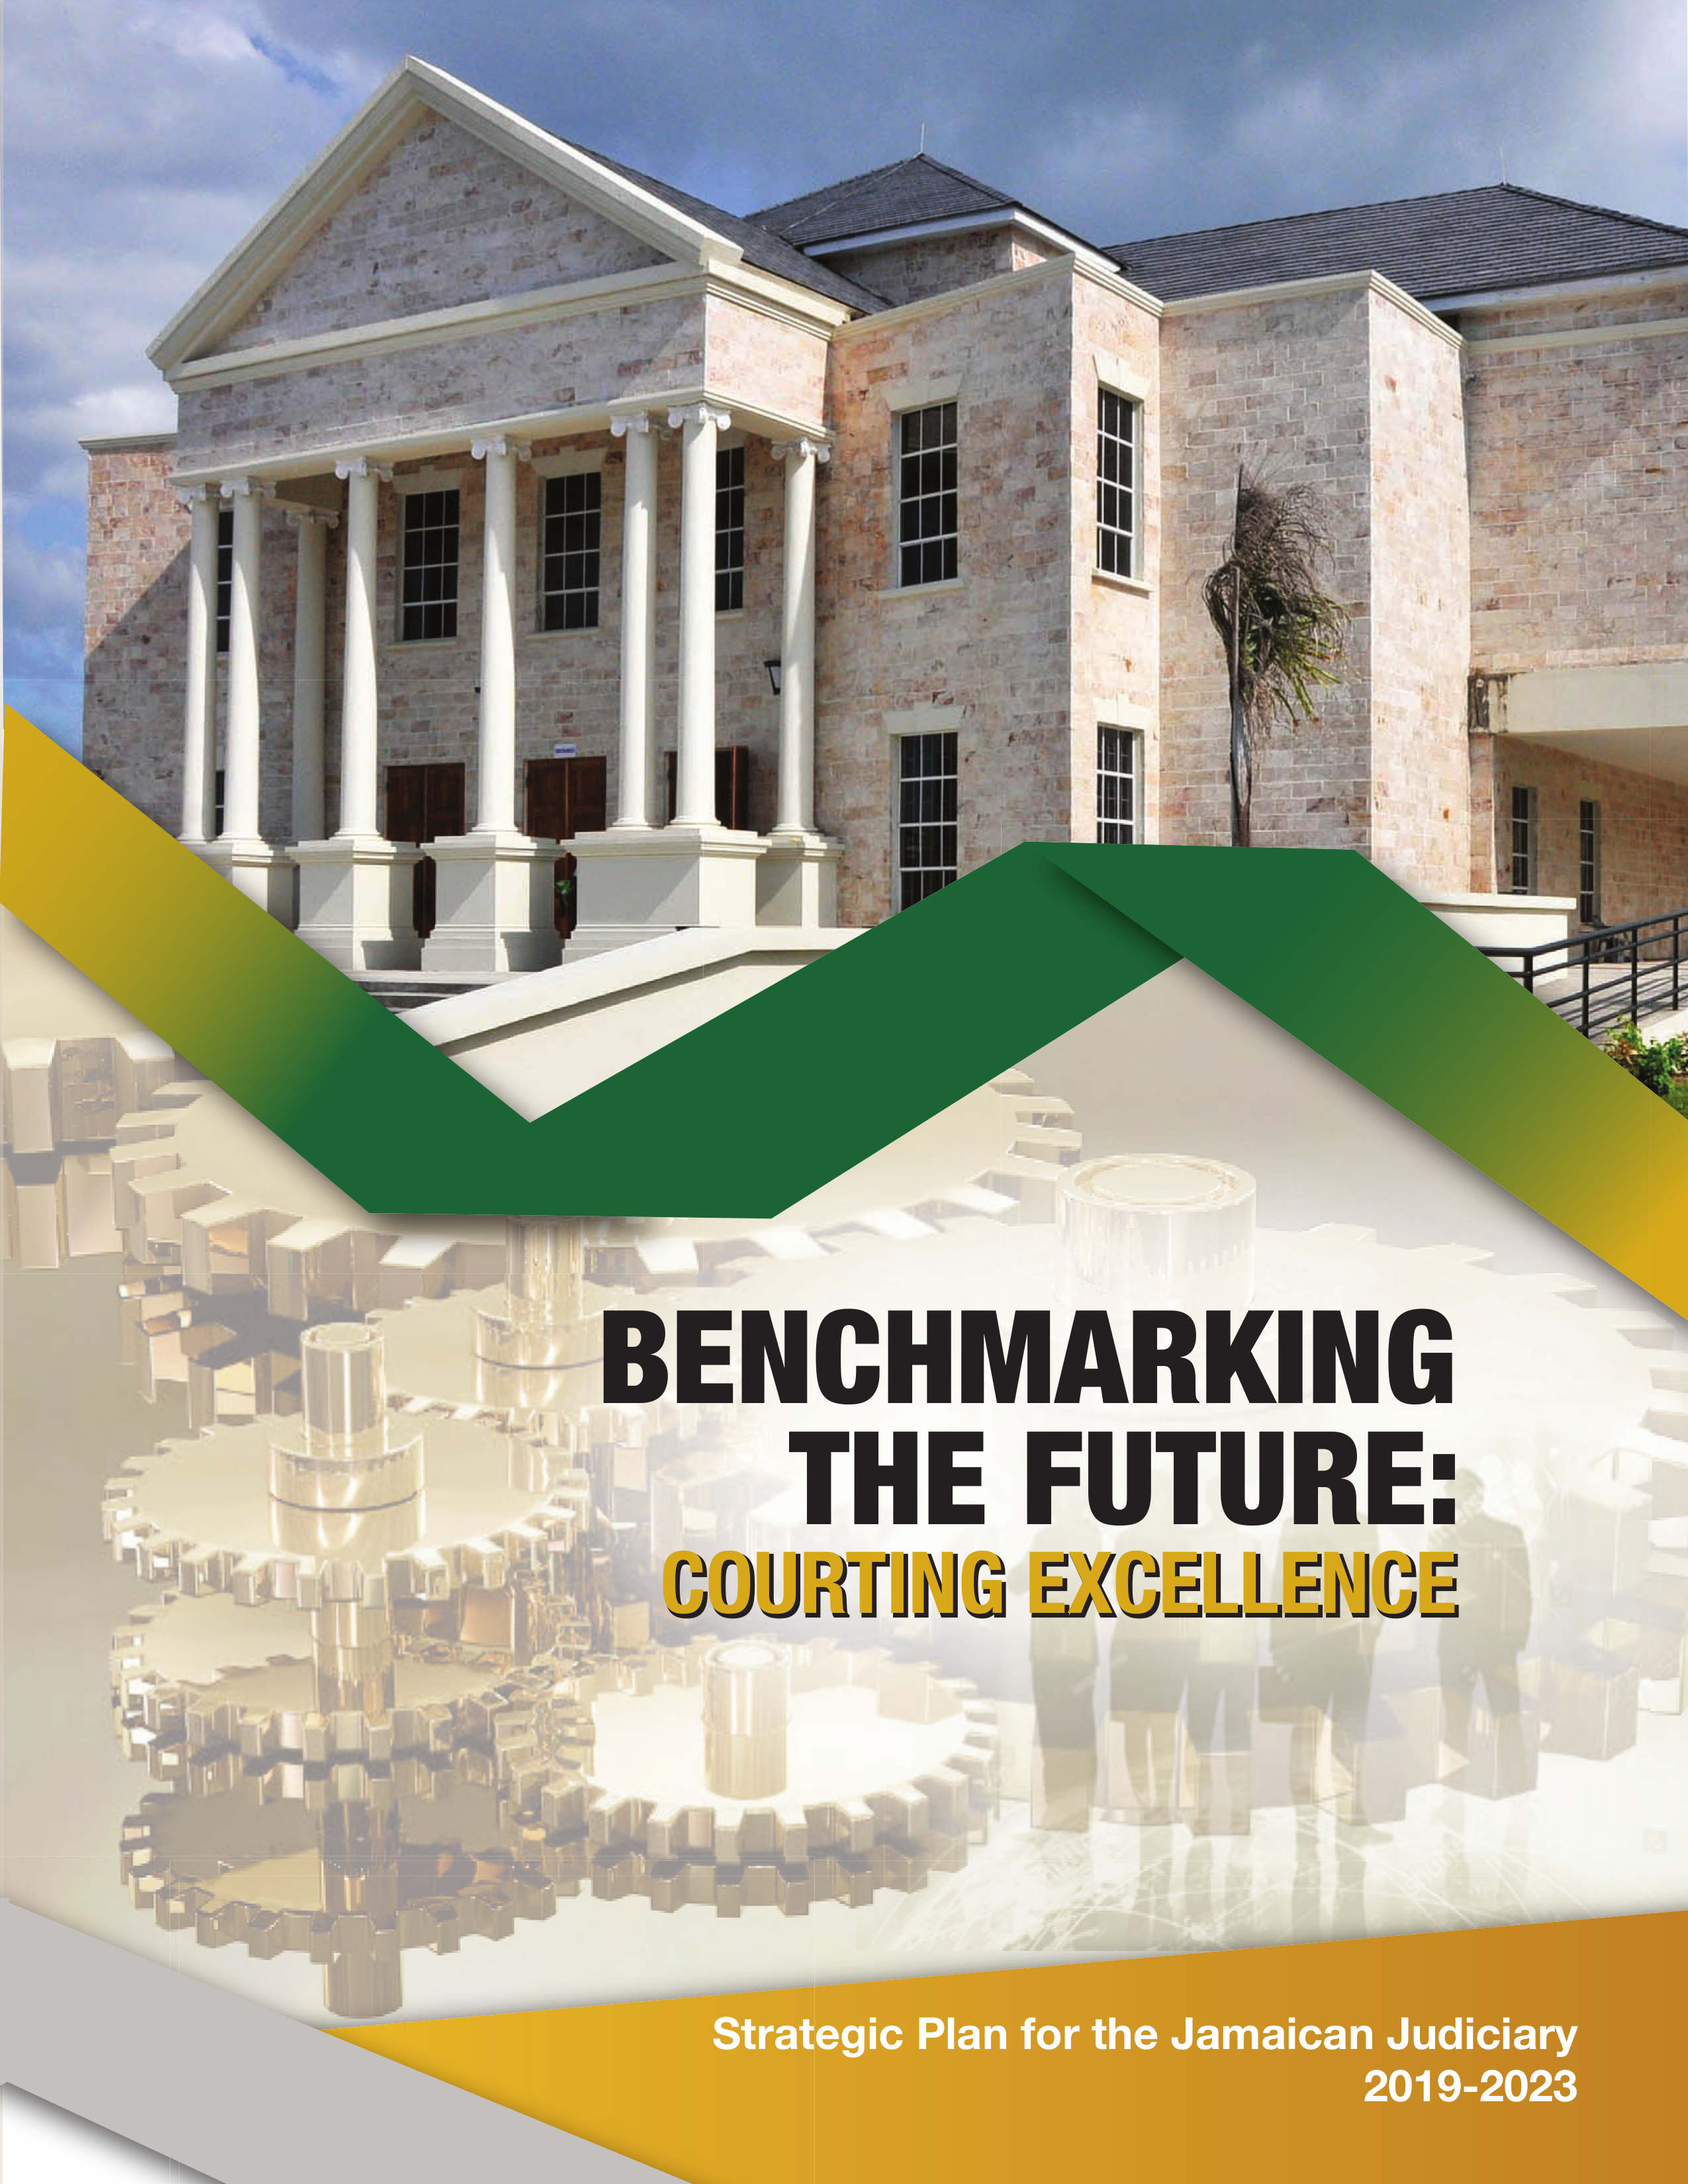 Strategic Plan for the Jamaican Judiciary 2019-2023